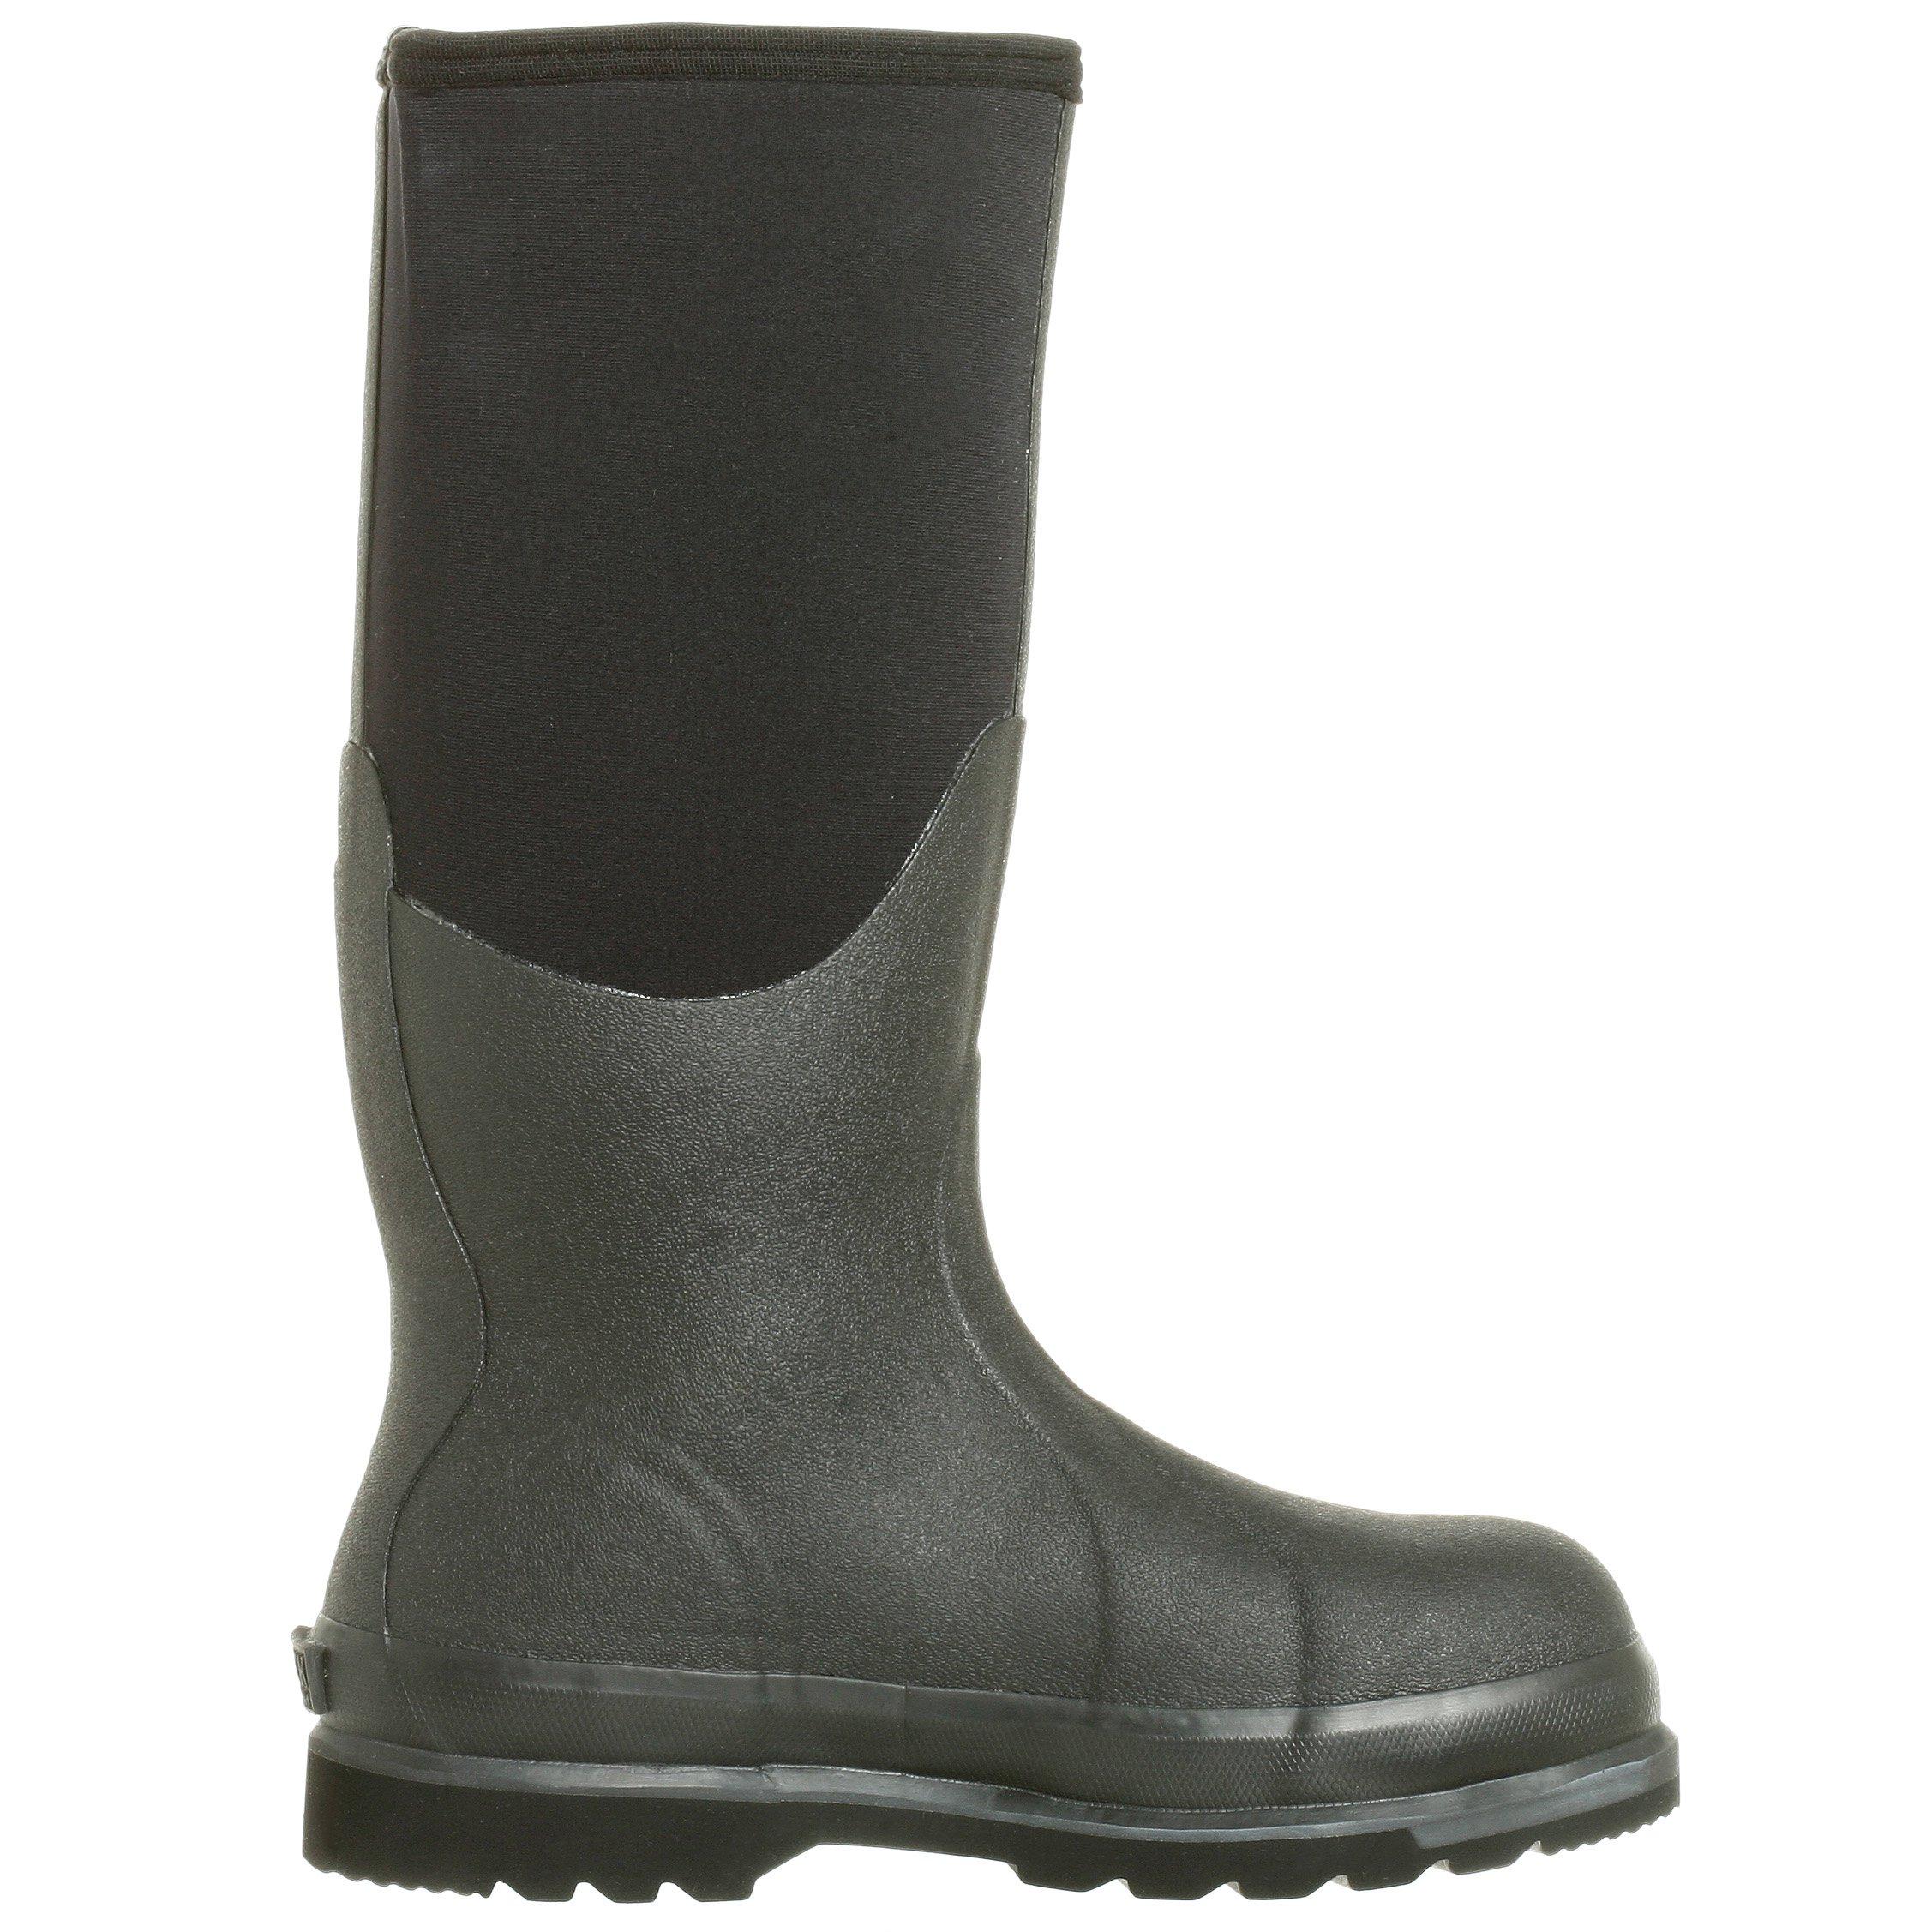 The Original MuckBoots Adult Chore Hi Boot Steel Toe,Black,Men's 12 M/Women's 13 M by Muck Boot (Image #6)